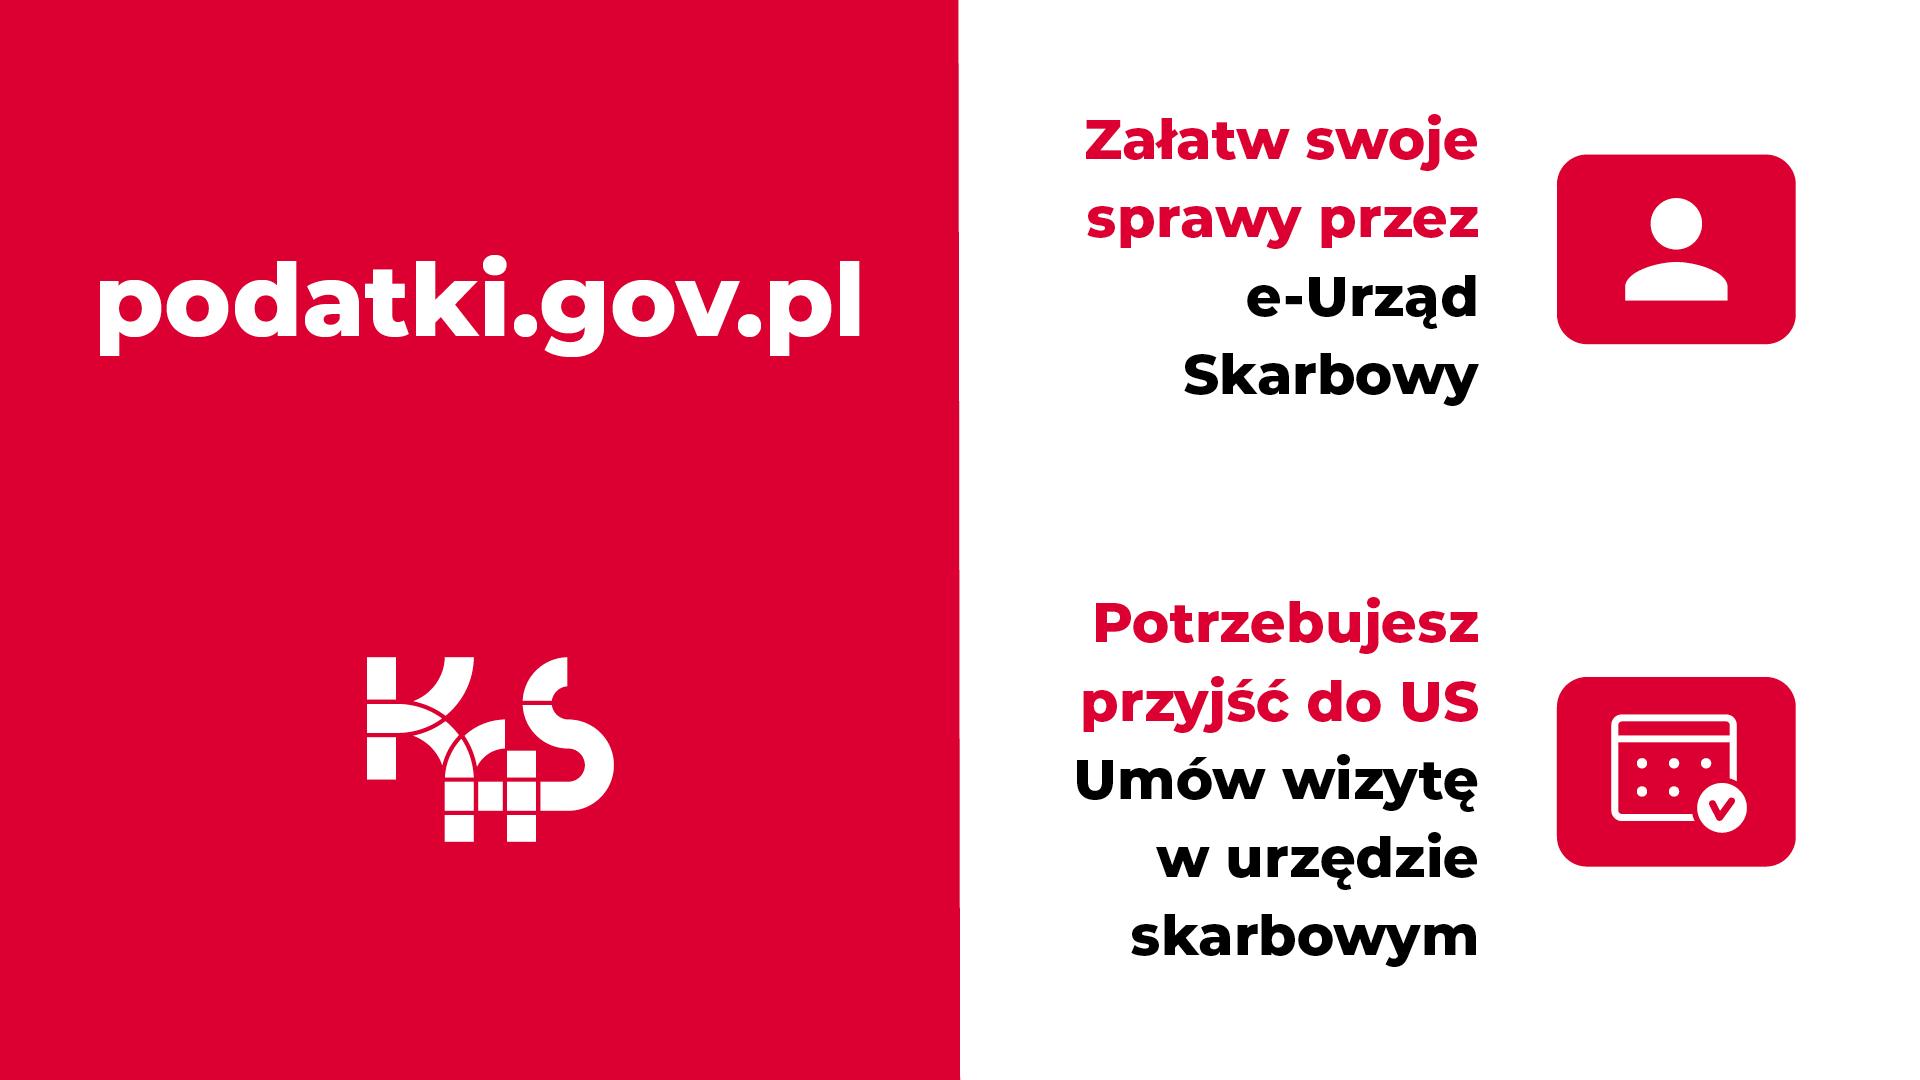 e-Urząd Skarbowy